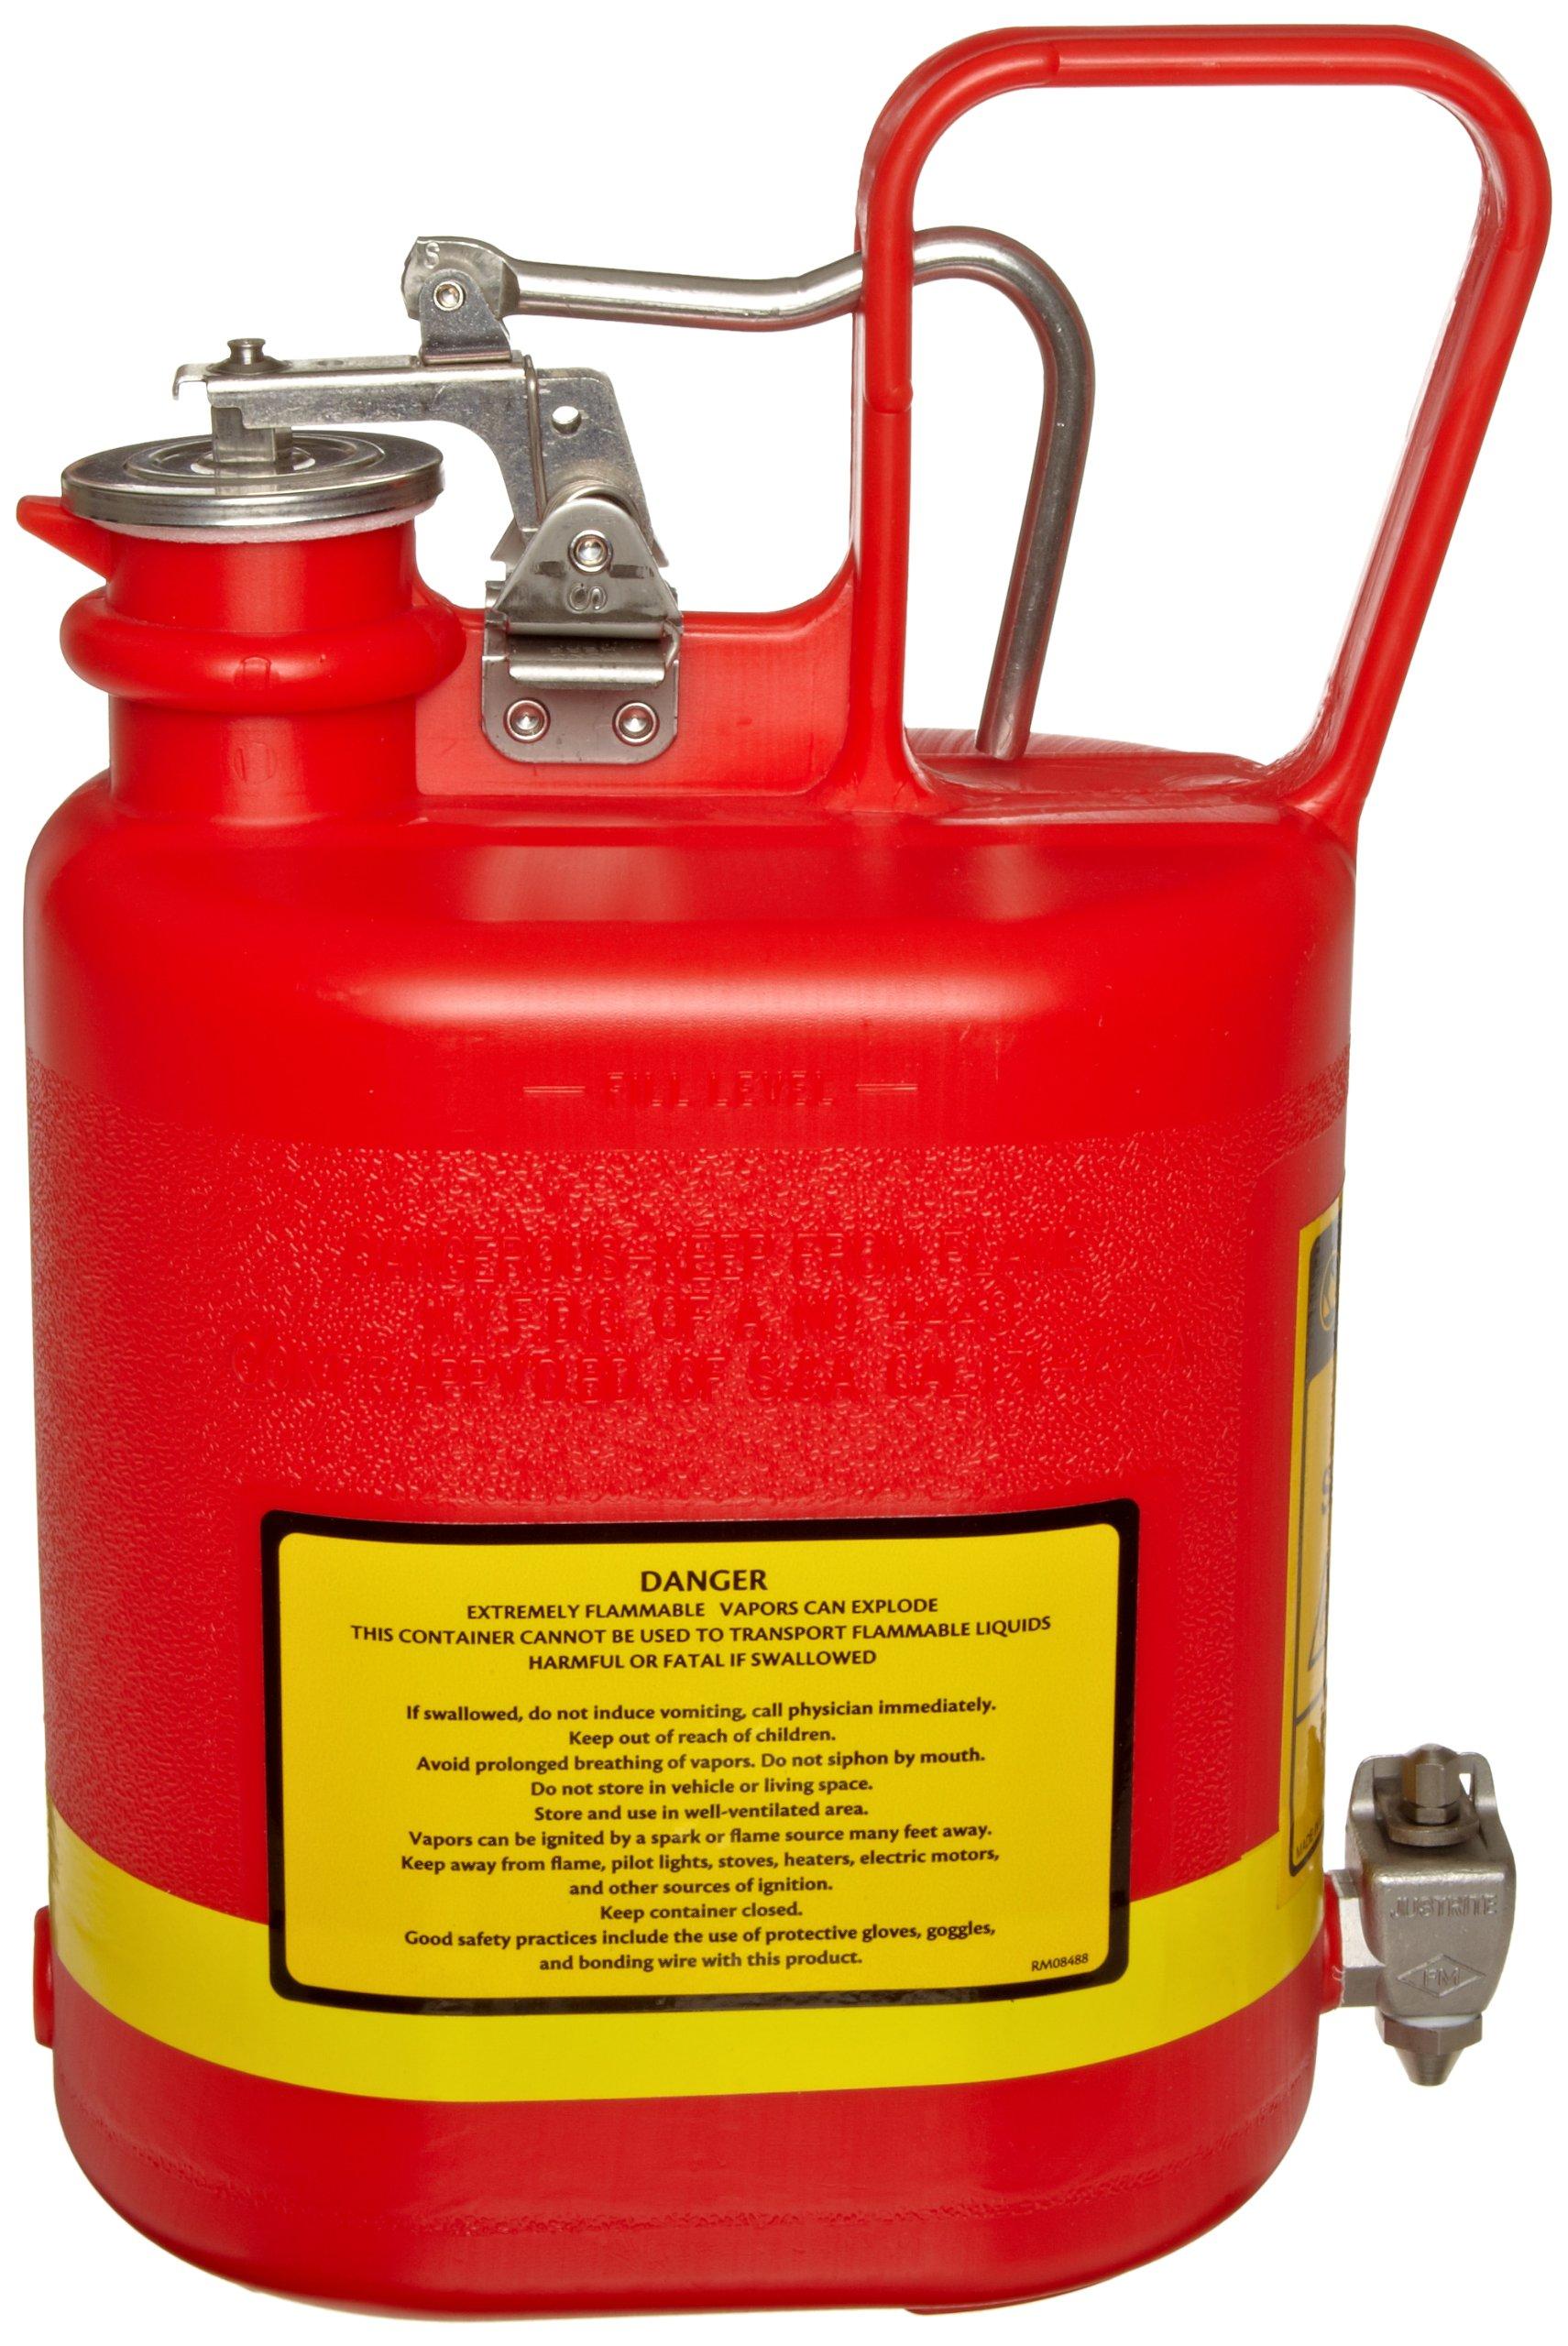 Justrite 14169 1 Gallon Laboratory Faucet Premium Polyethylene Safety Can